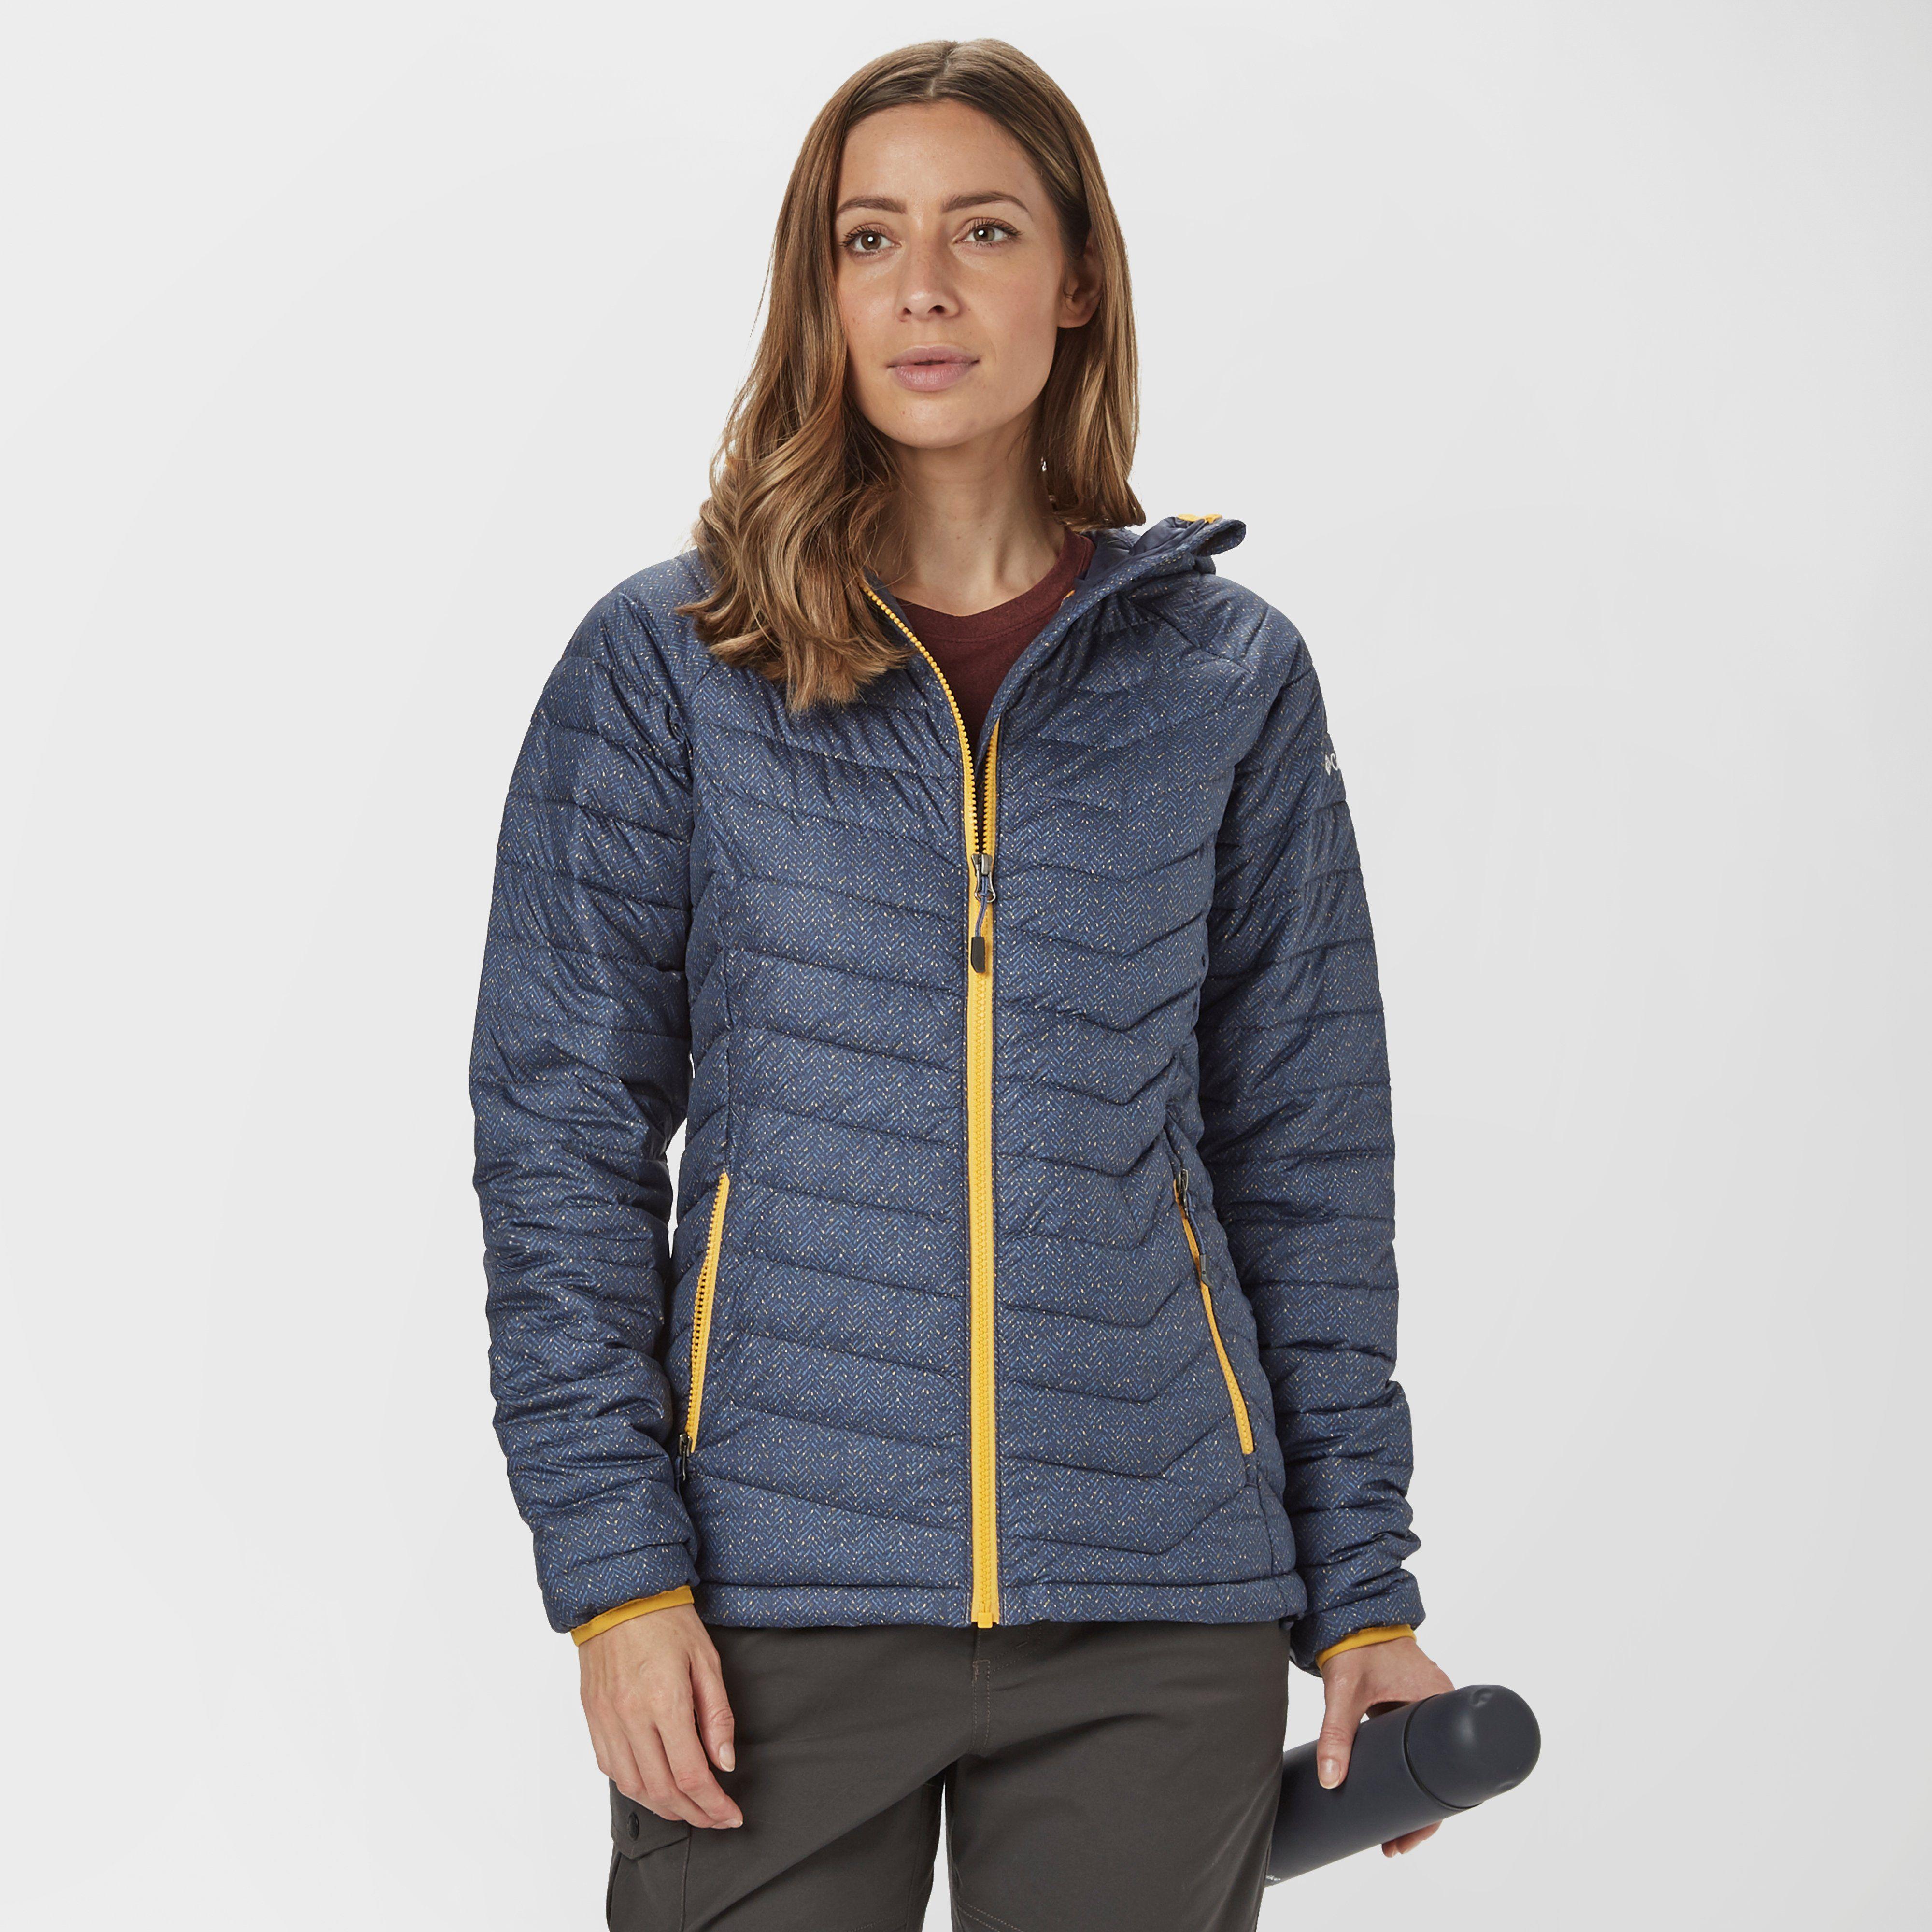 COLUMBIA Women's Powder Lite™ Insulated Jacket